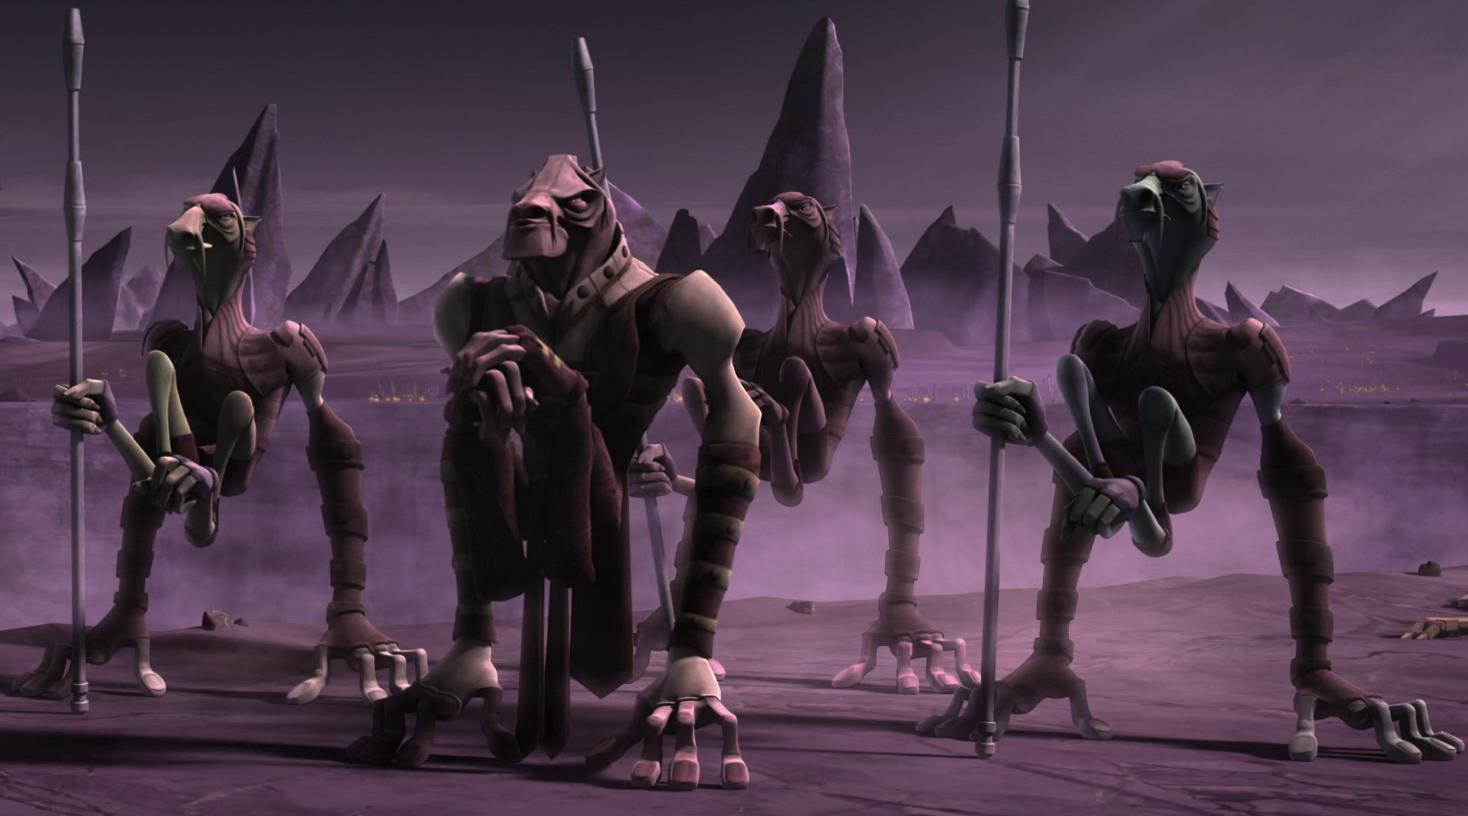 Nakha Urus Wookieepedia The Star Wars Wiki